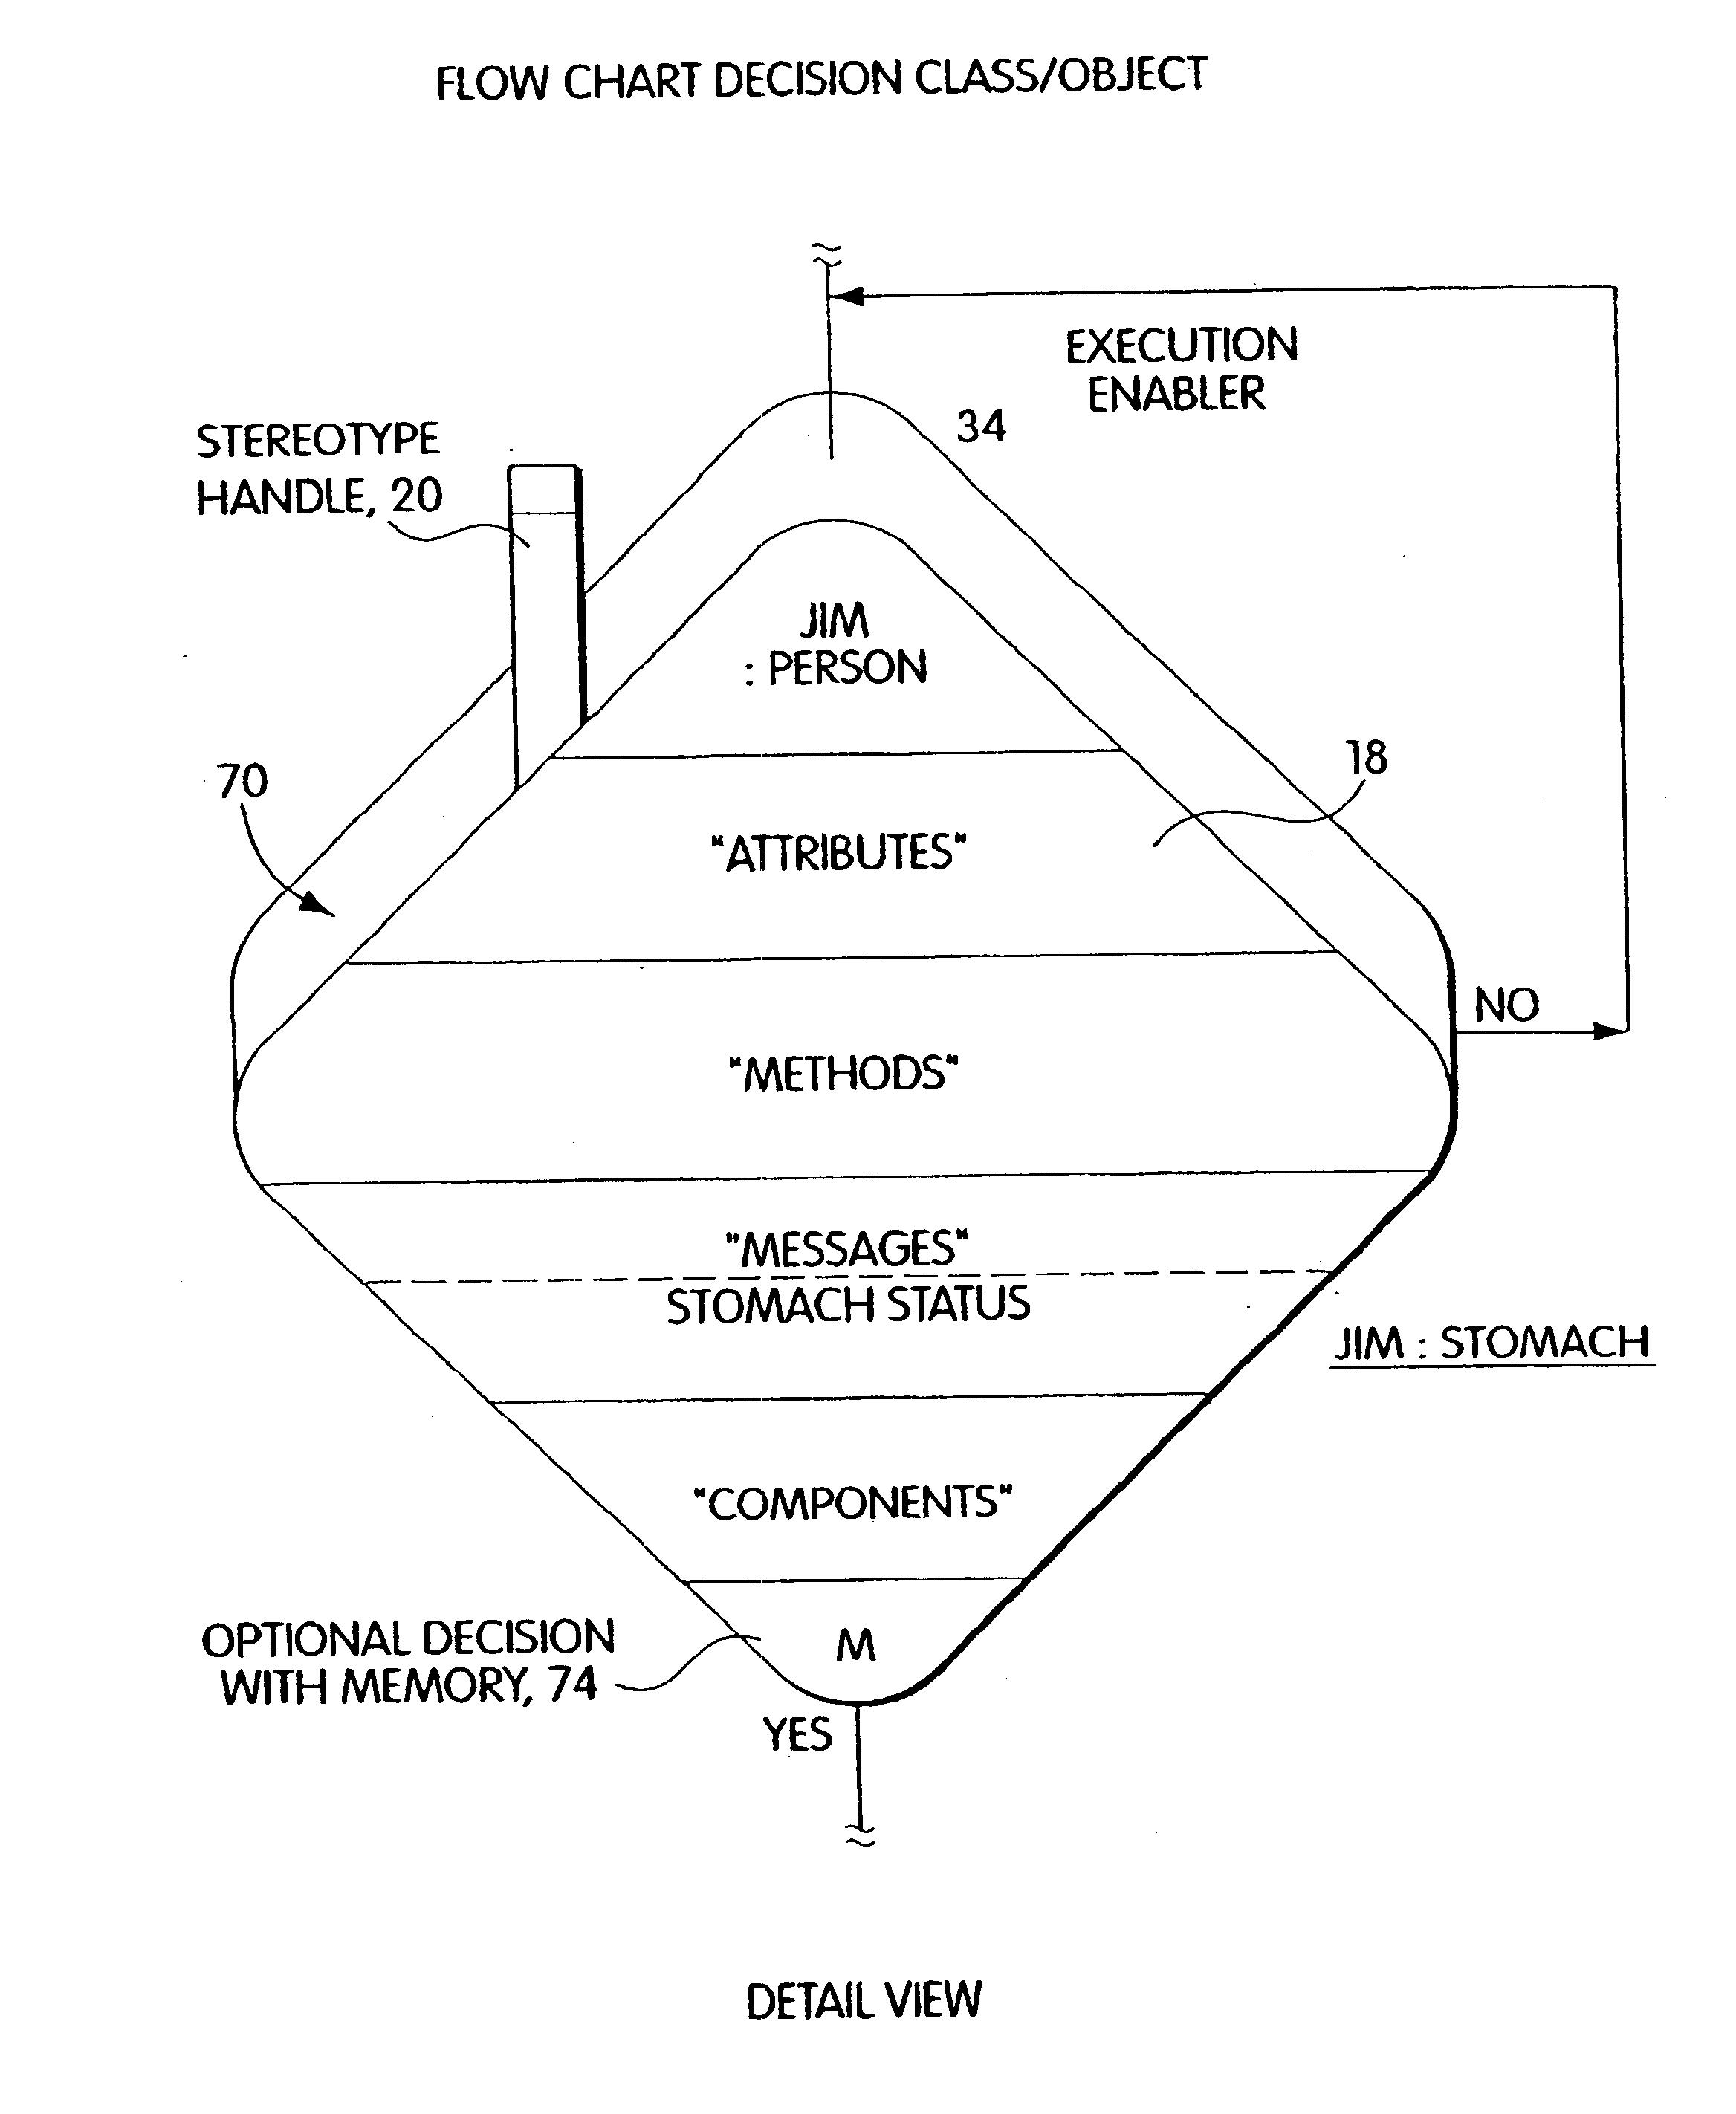 C programming flowchart pdf create a flowchart flowchart pdf what is the patent flowchartcrown shin intellectual property office nvjuhfo Images